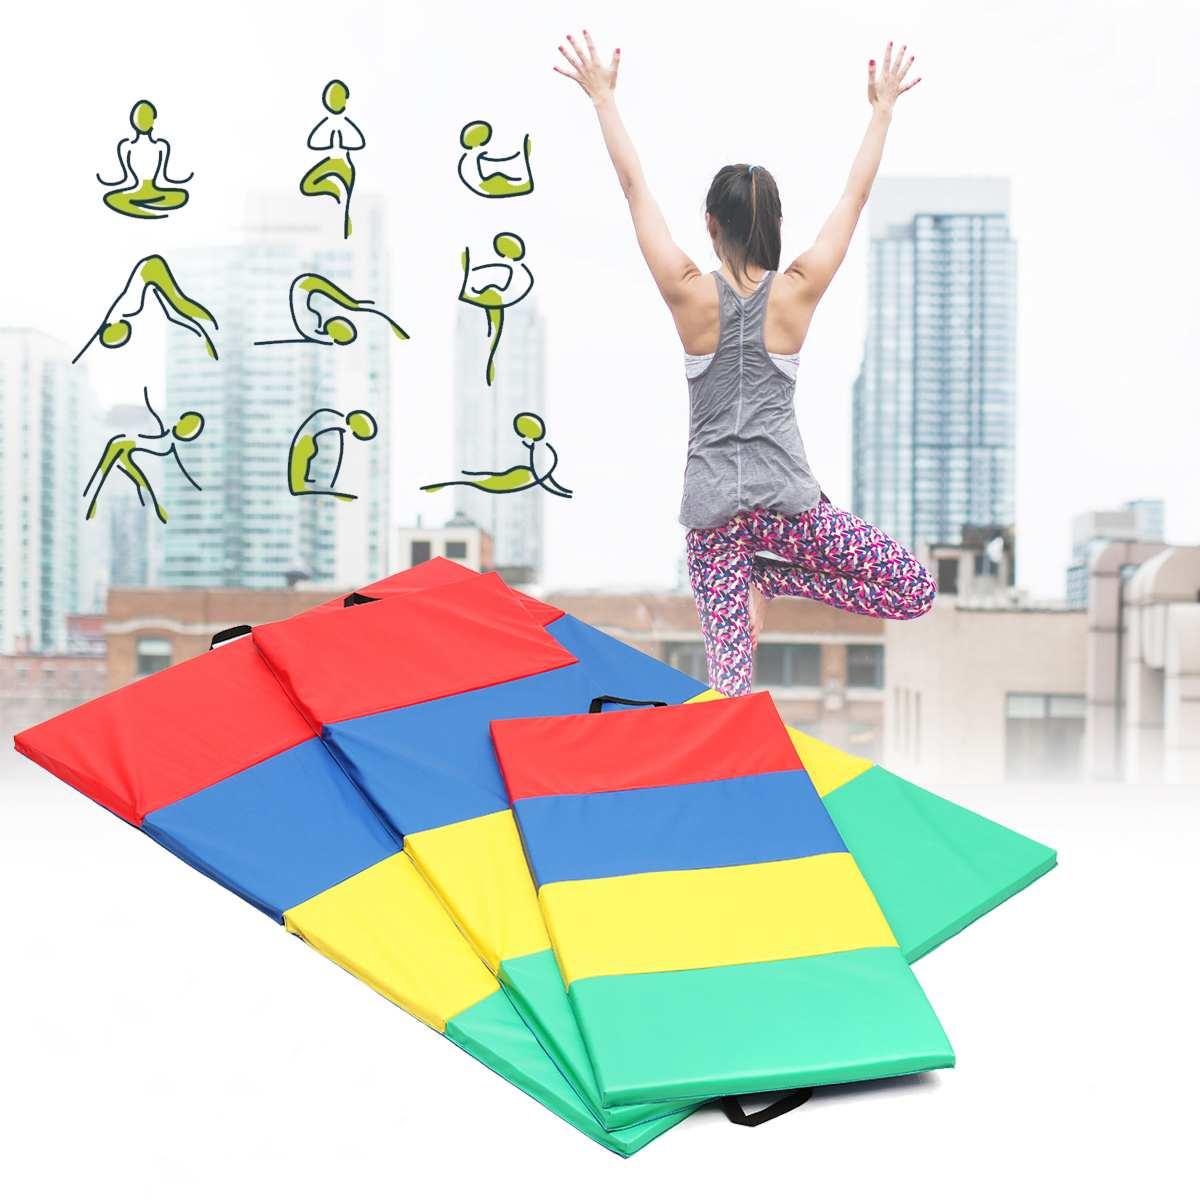 4 Folding Gymnastics Mat Yoga Exercise Gym Airtrack Panel Tumbling Climbing Pilates Pad Air Track4 Folding Gymnastics Mat Yoga Exercise Gym Airtrack Panel Tumbling Climbing Pilates Pad Air Track